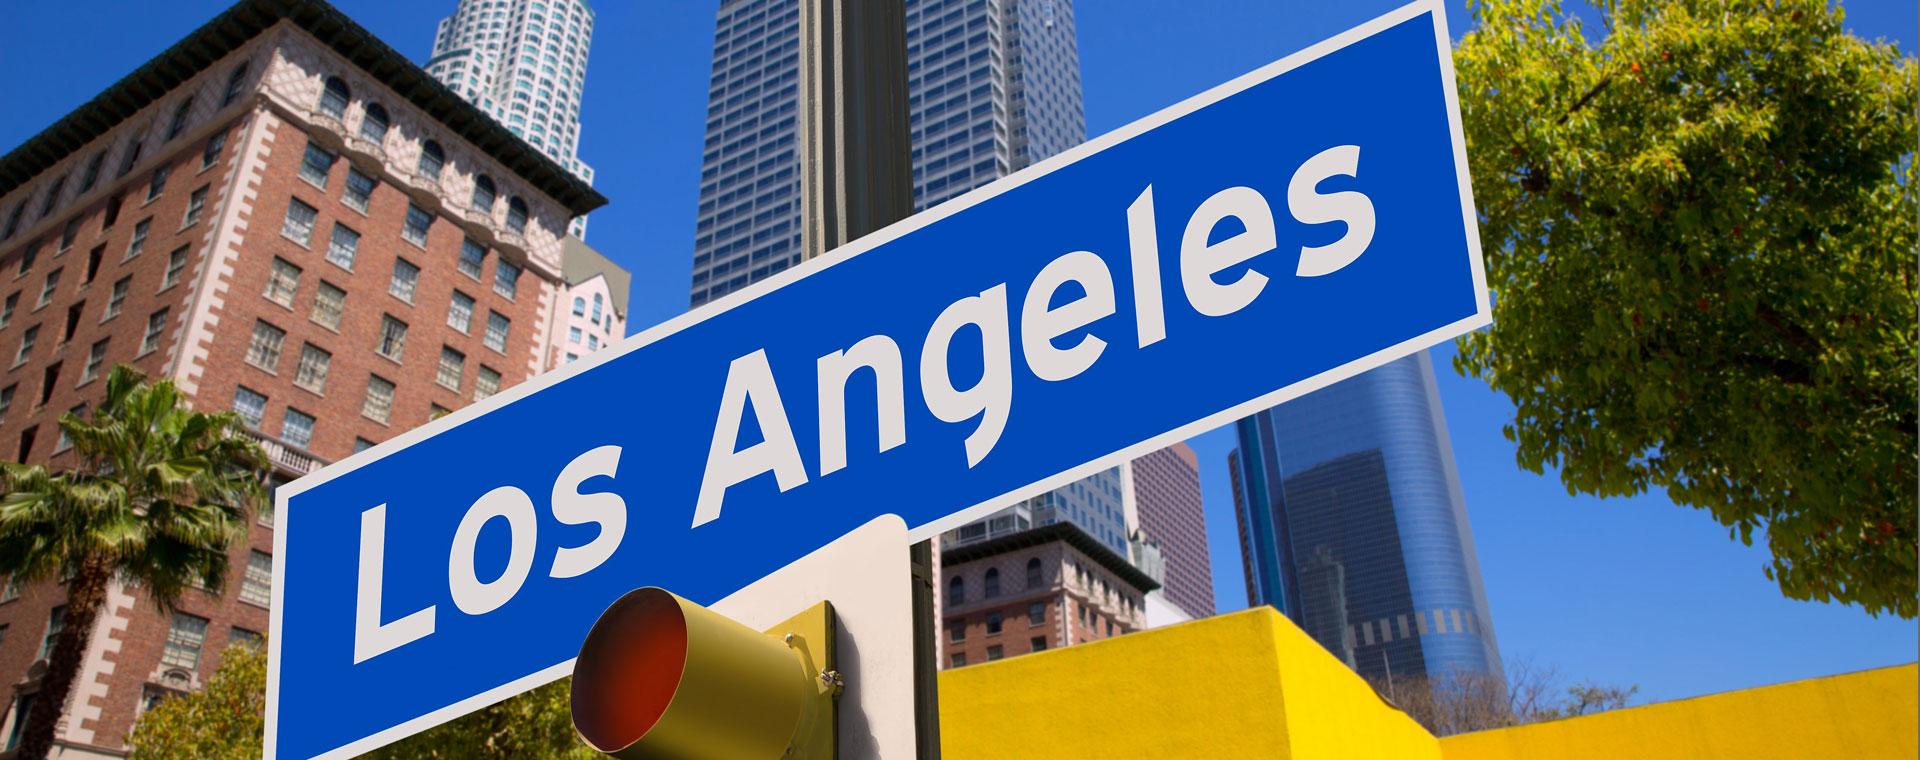 LMU: LA Police Survey